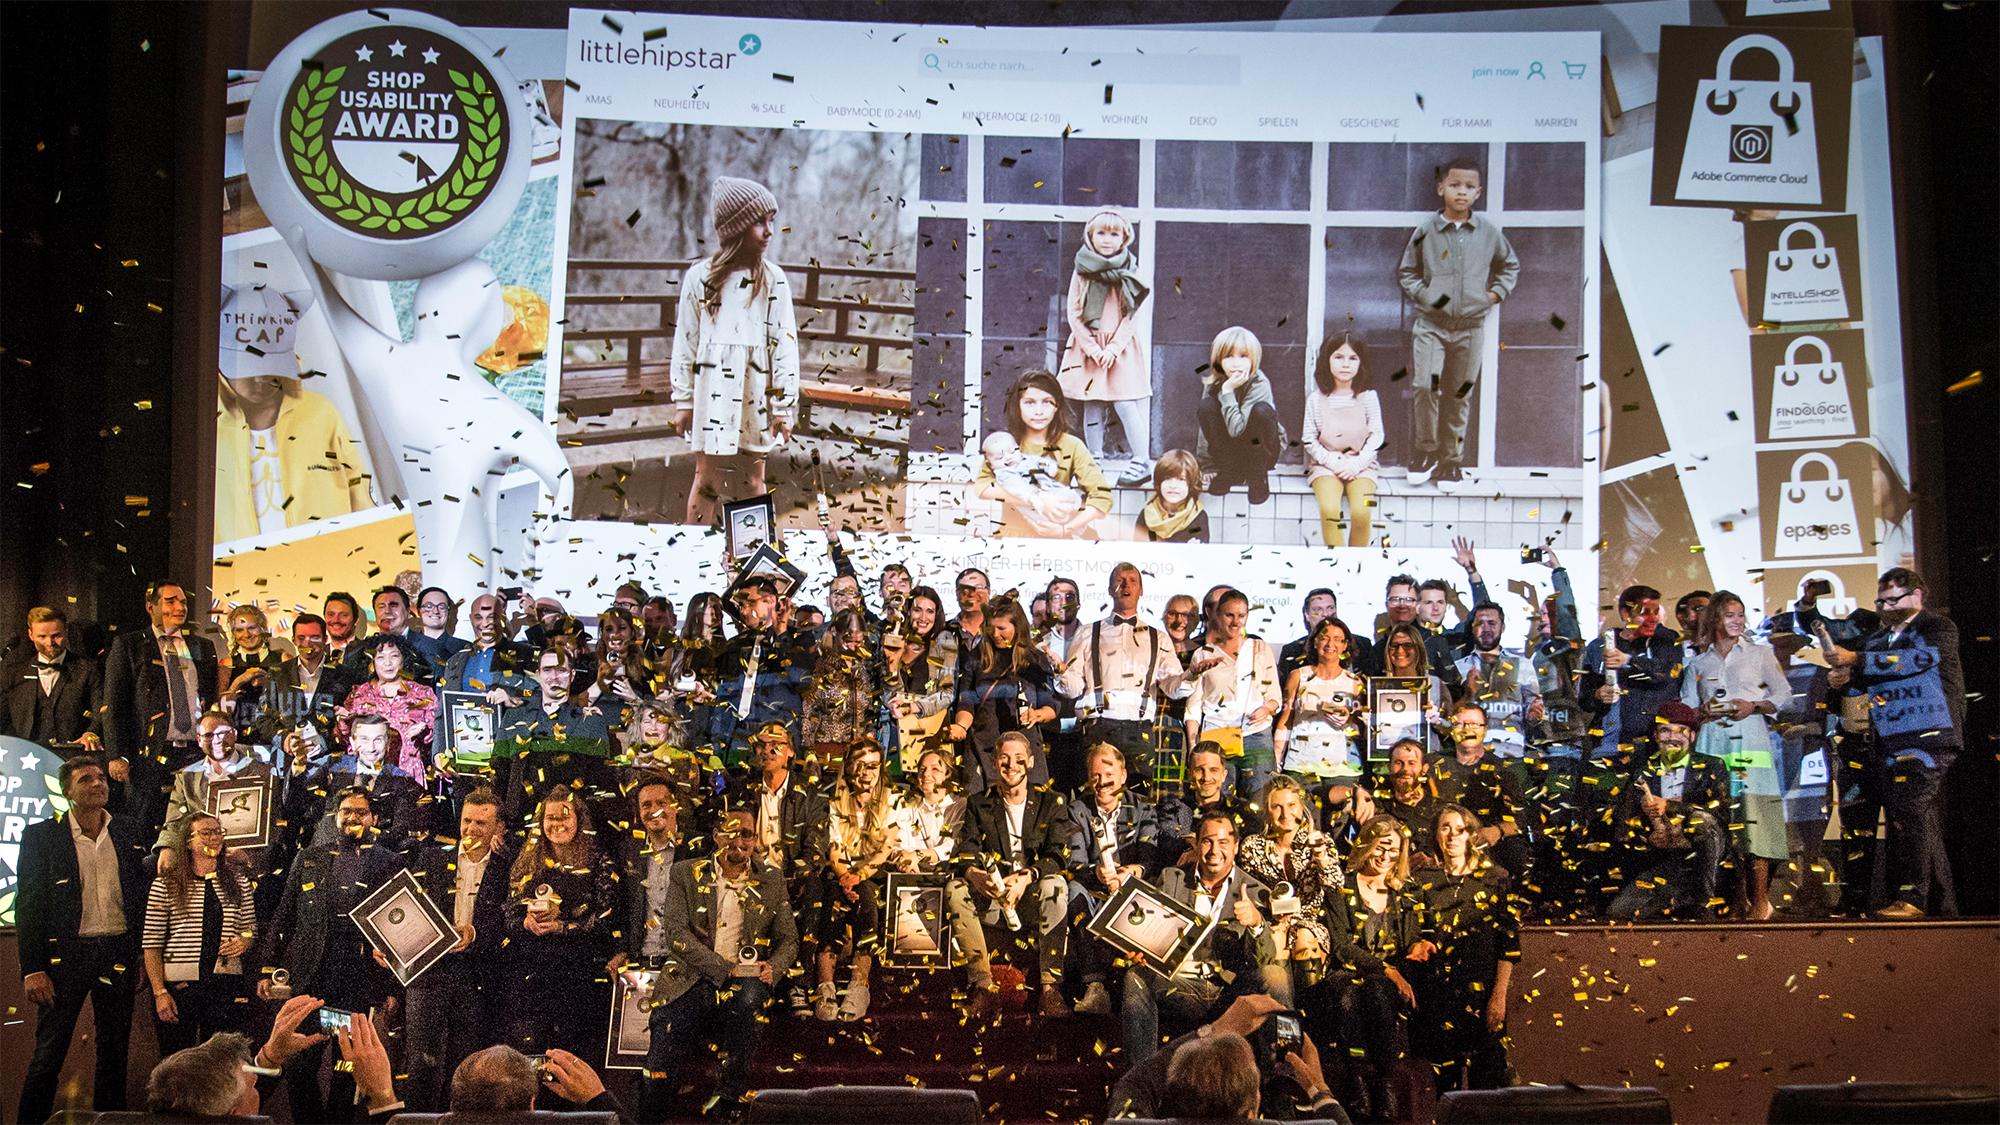 Shop Usability Award 2019 - Preisverleihungala in München - Foto: Max Prechtel / Shoplupe GmbH